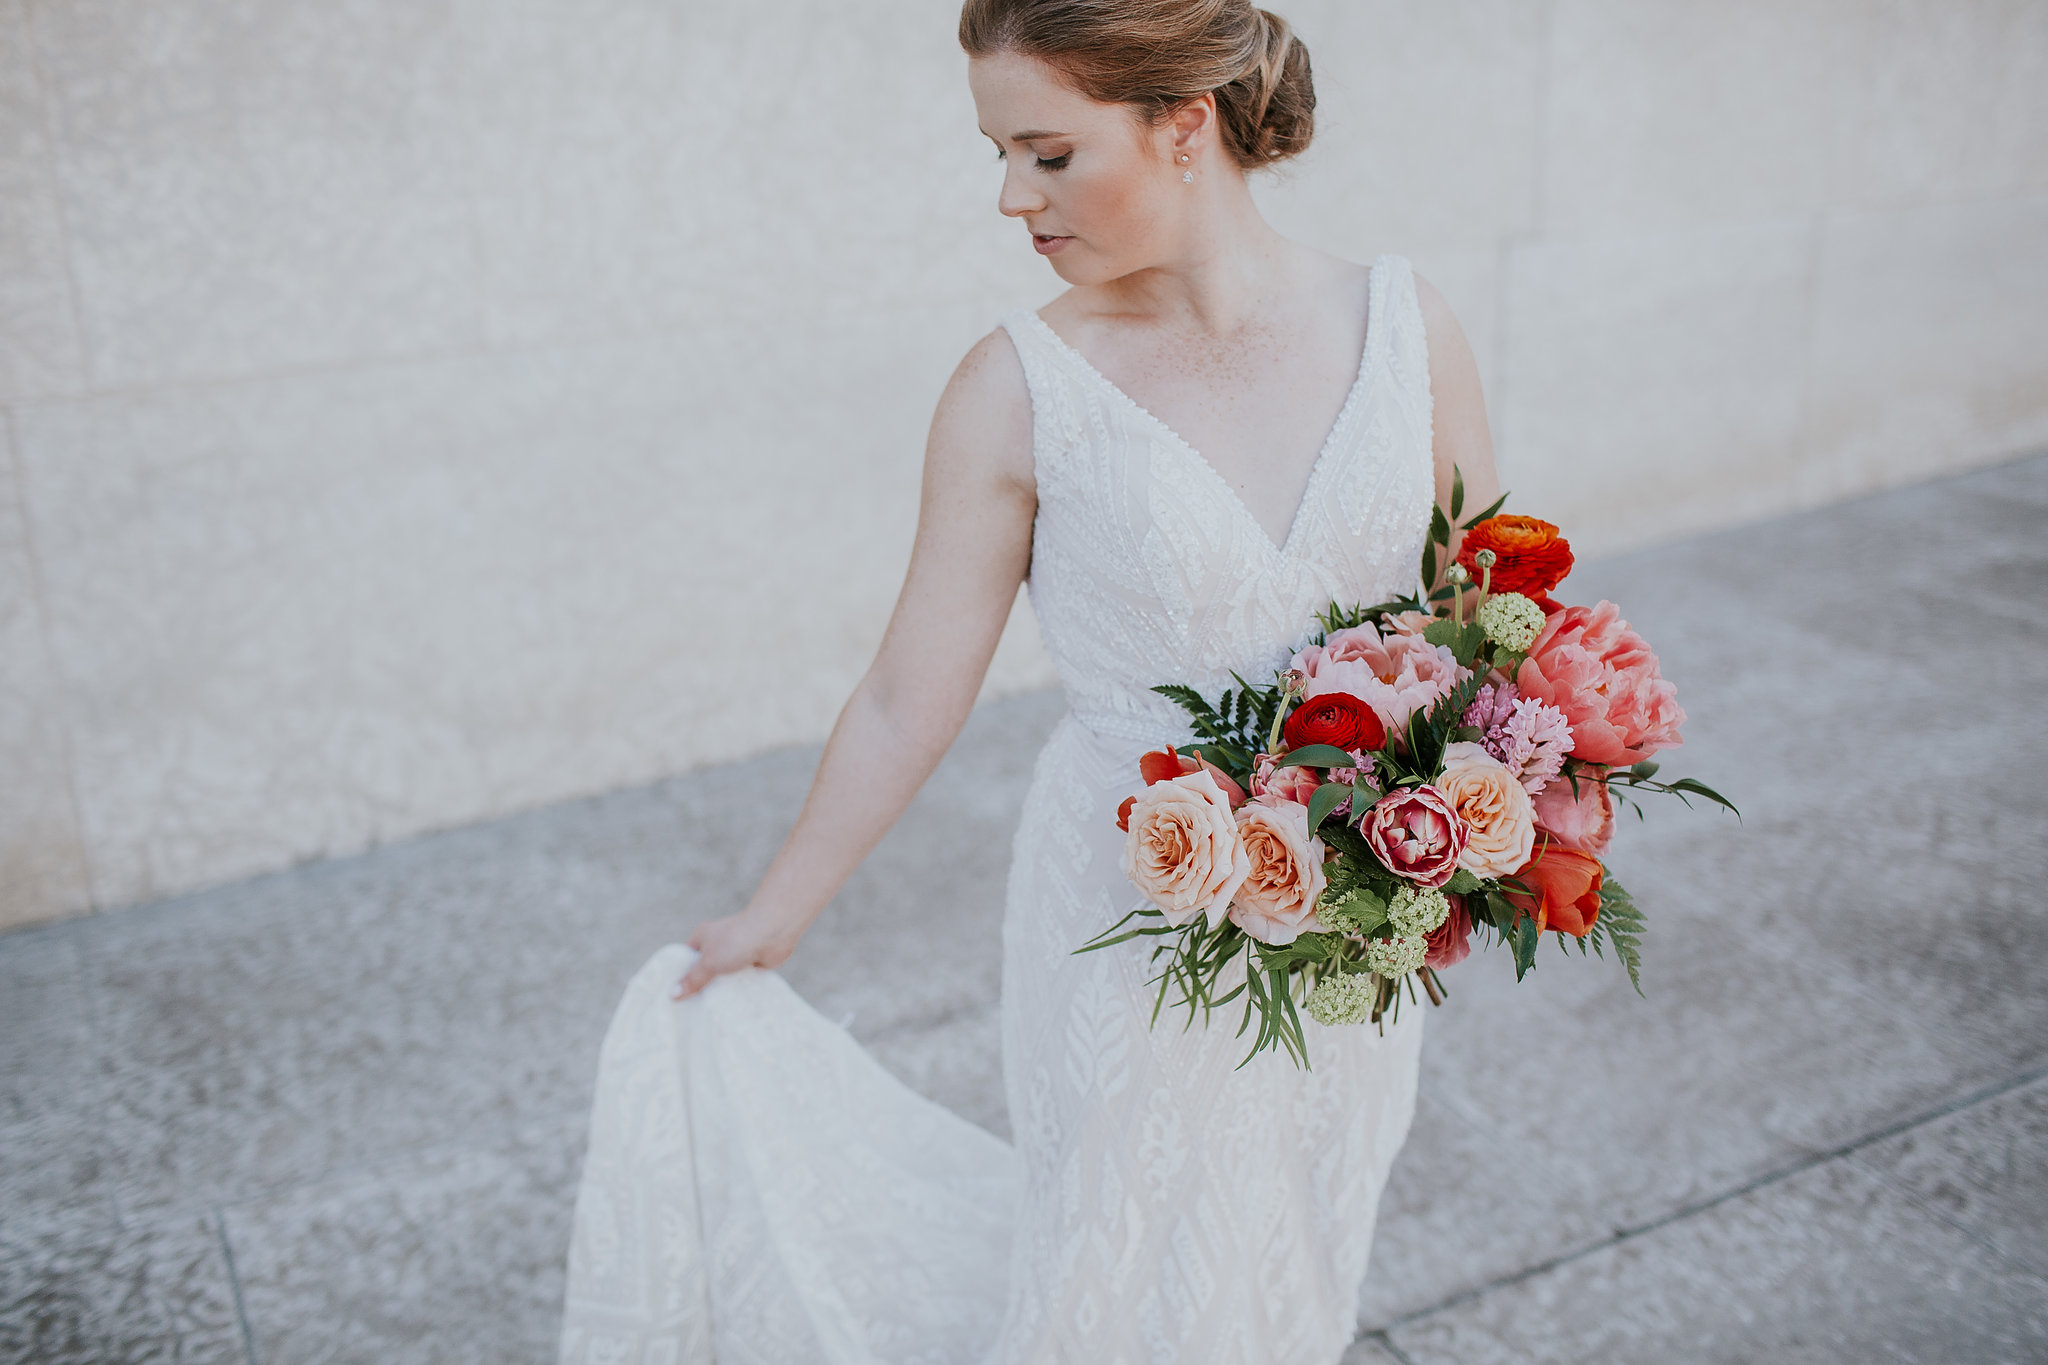 Coral and Peach Wedding Flowers - Garden Inspired Wedding Florals